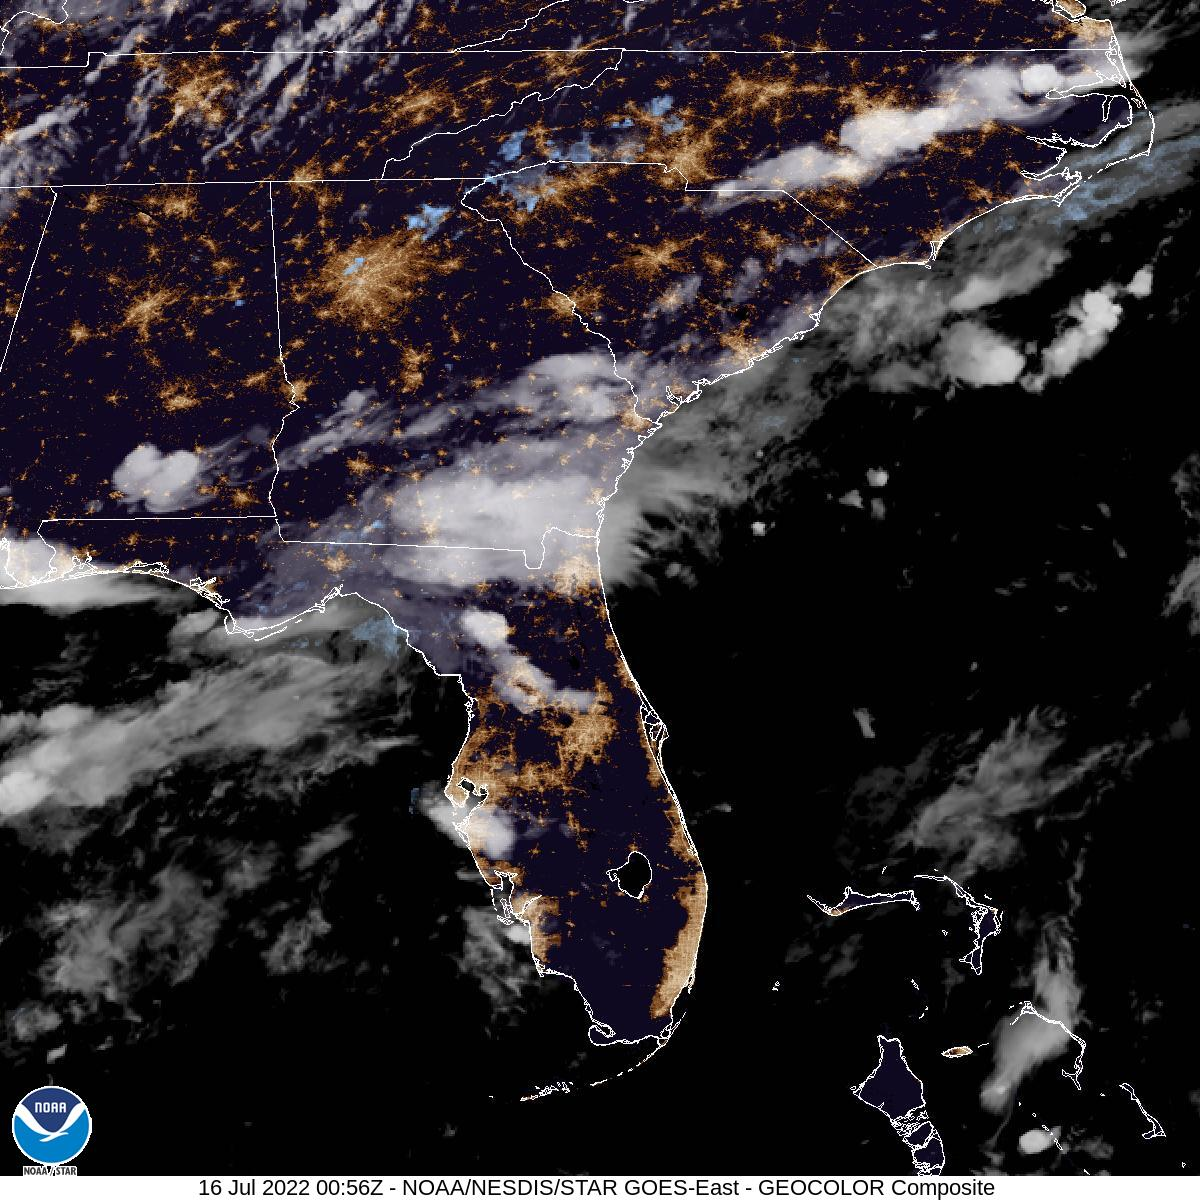 http://weather.msfc.nasa.gov/GOES/goeseastconus.htm